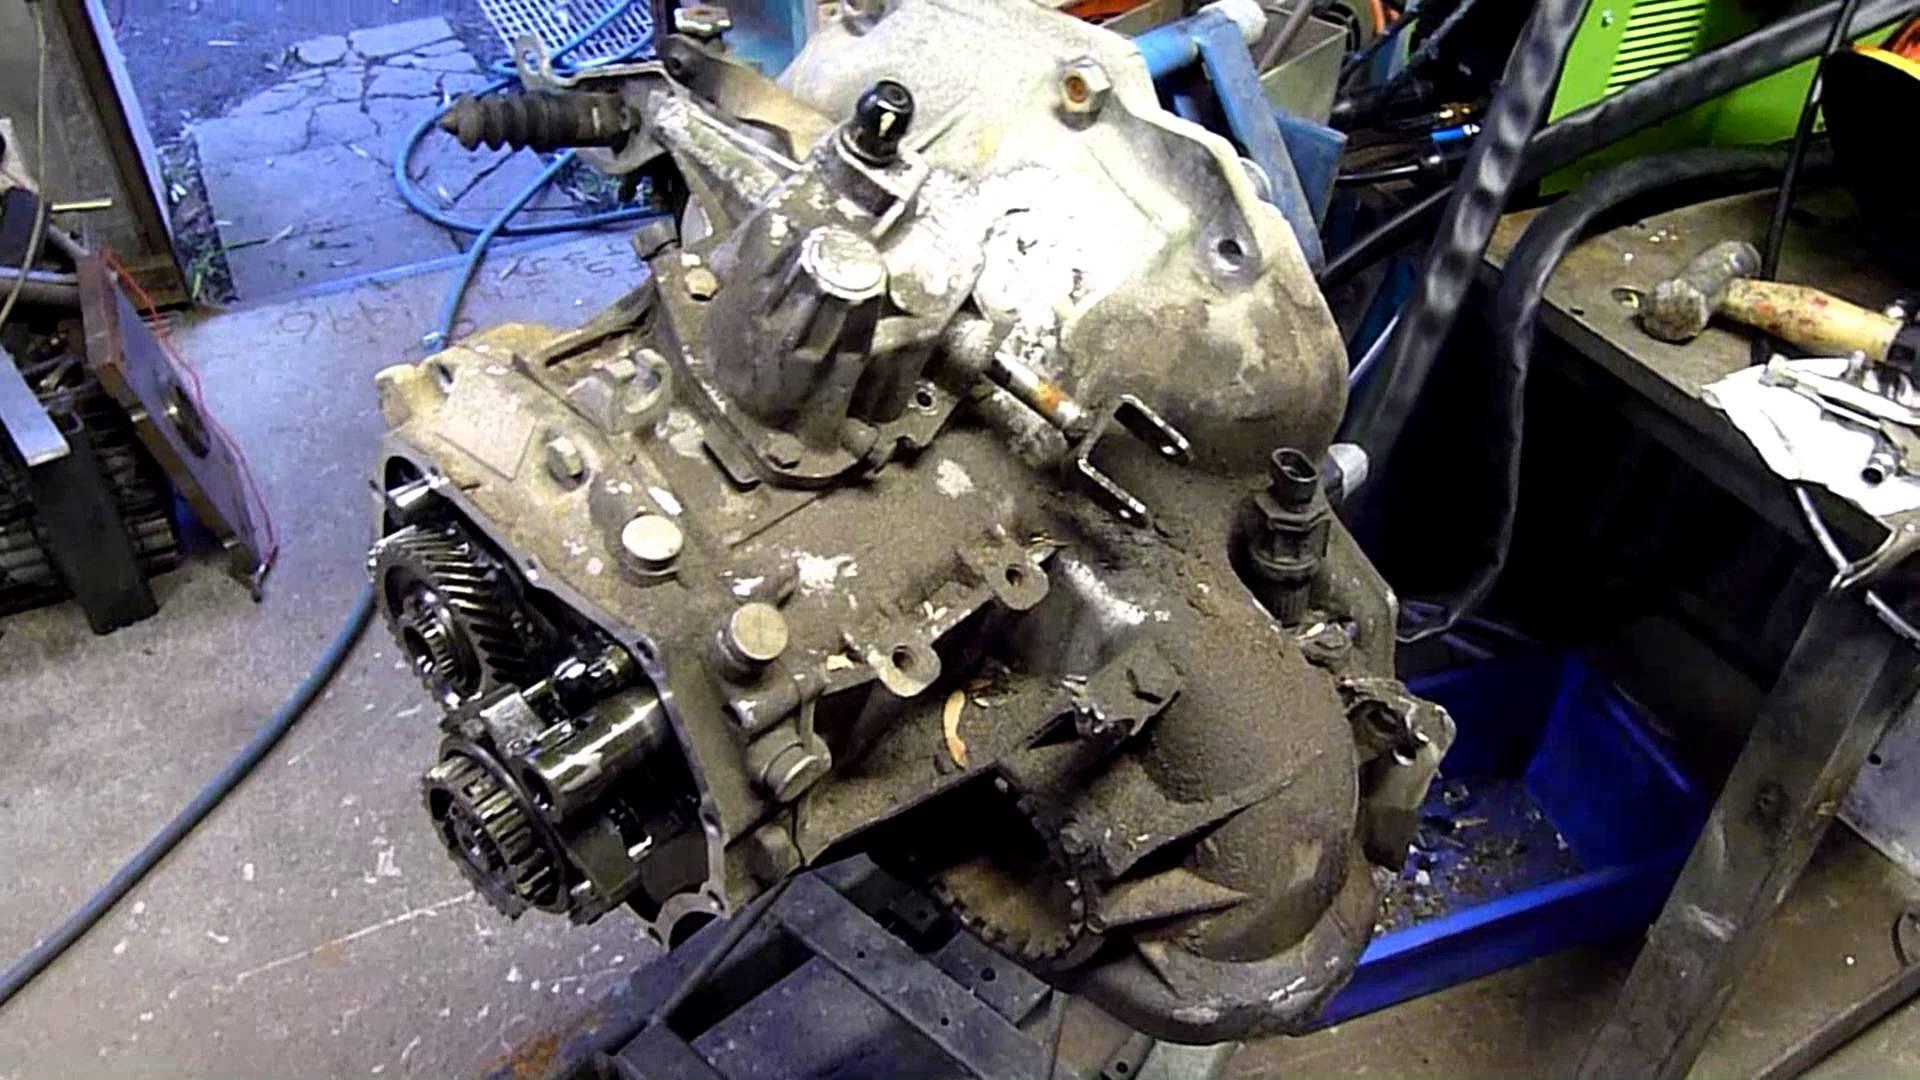 Daewoo Lanos Engine Diagram Gm Daewoo Opel Fwd 5sp Manual Transmission Autopst Pt1 Of Daewoo Lanos Engine Diagram